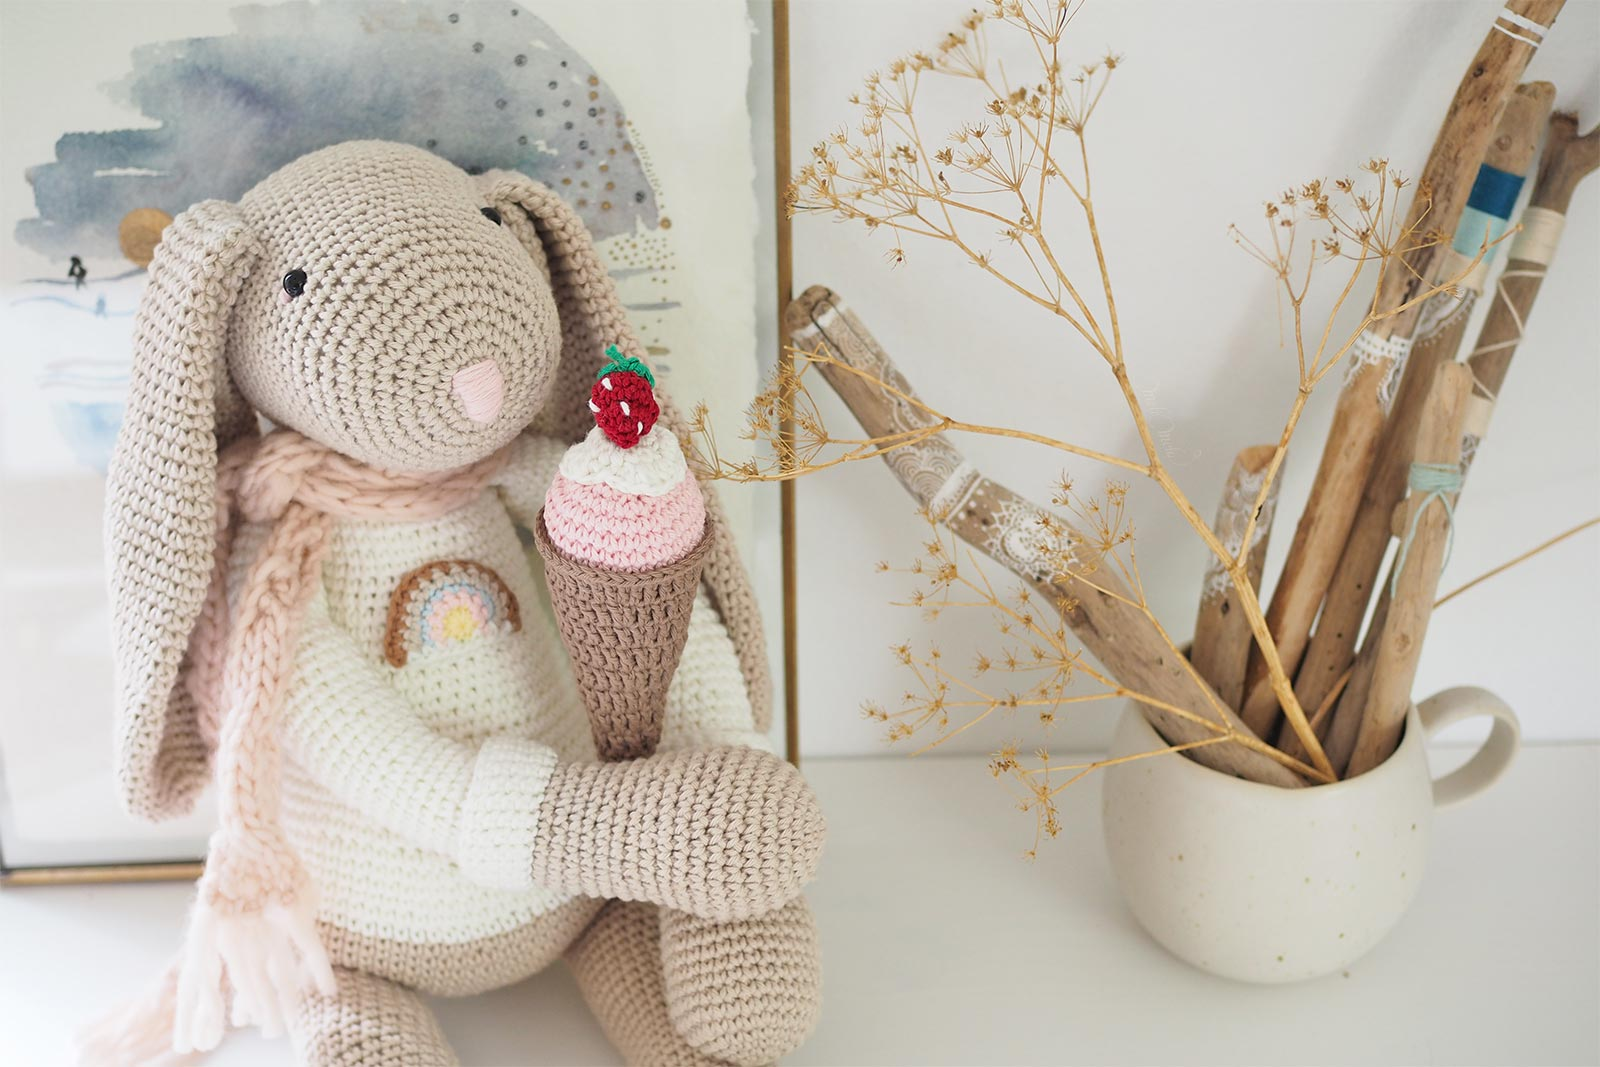 Lapin au crochet xl, amigurumi 80 cm - Un grand marché | 1067x1600